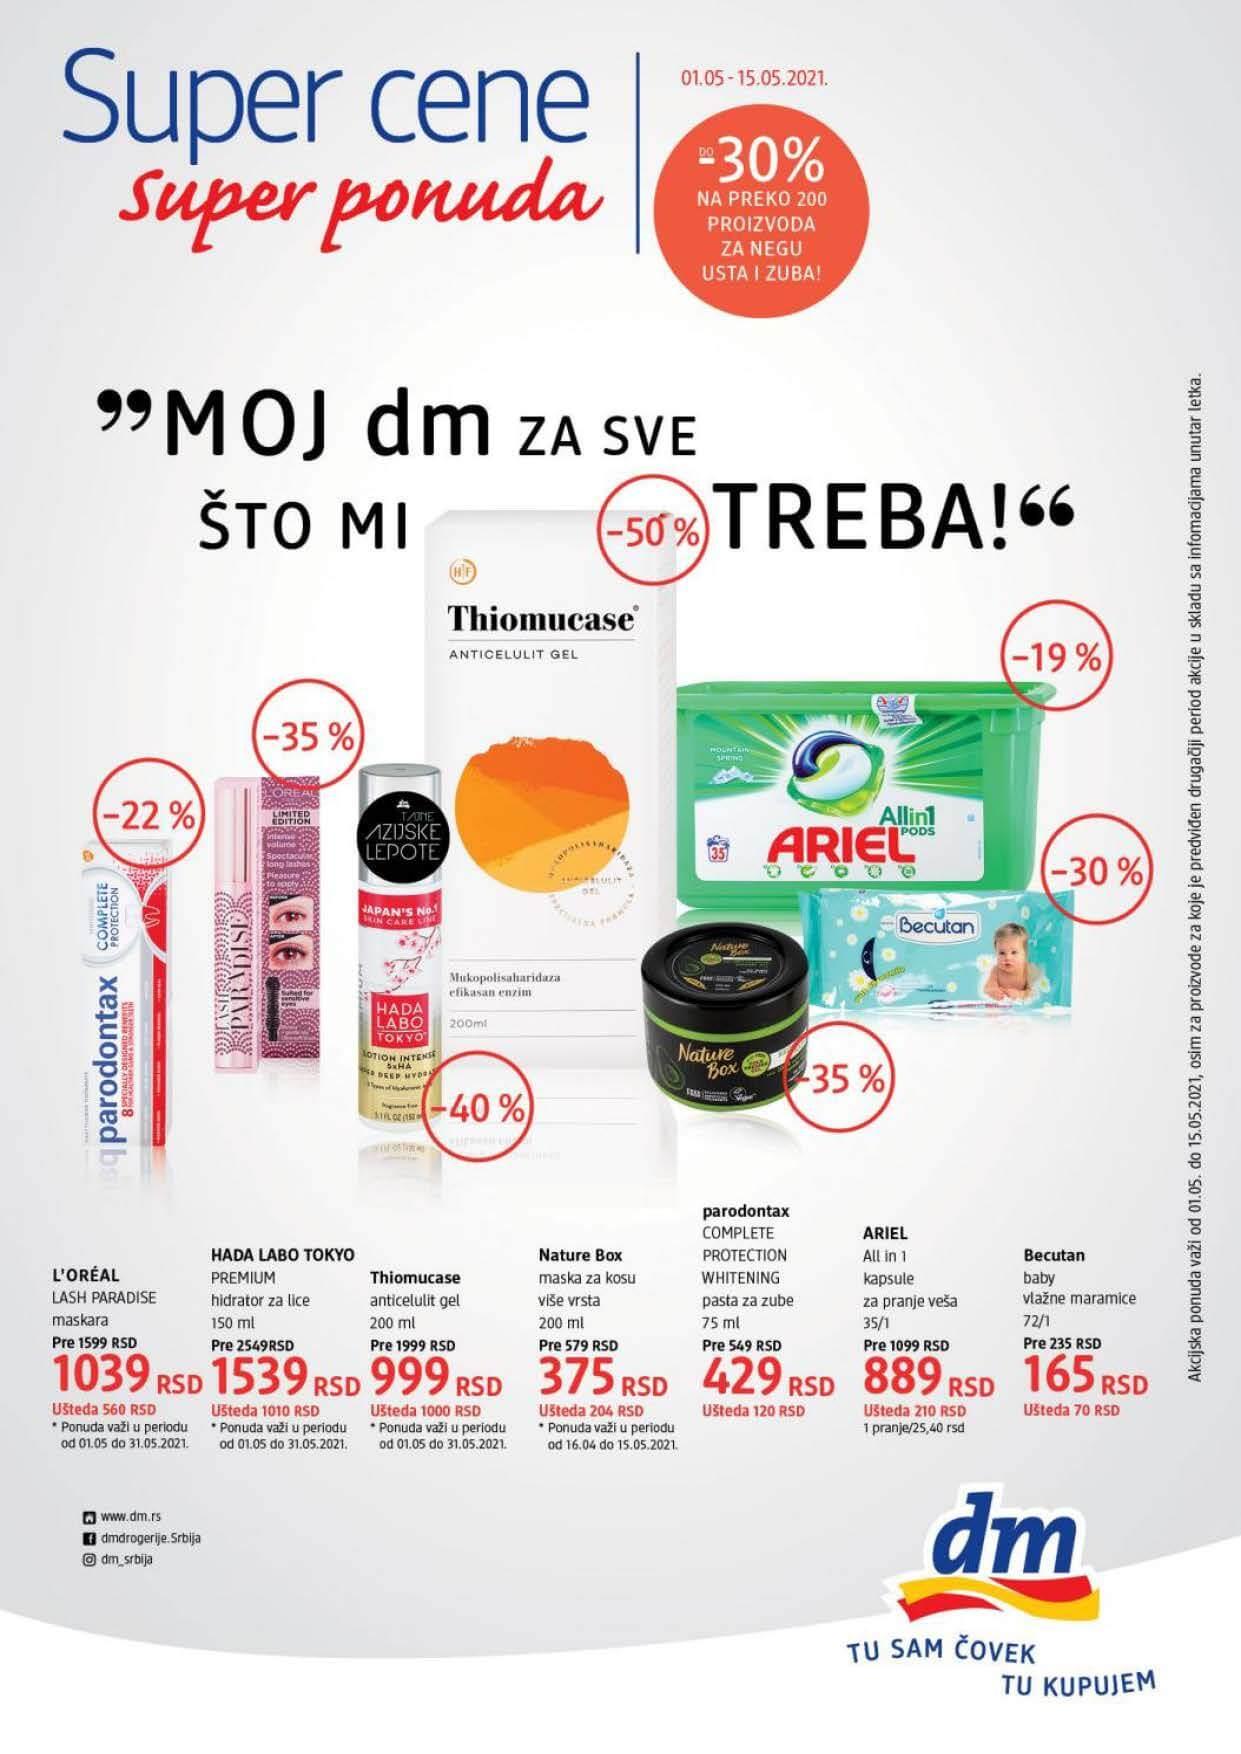 DM katalog SUPER CENE Srbija MAJ 2021 01.05.2021. 15.05.2021. Page 1